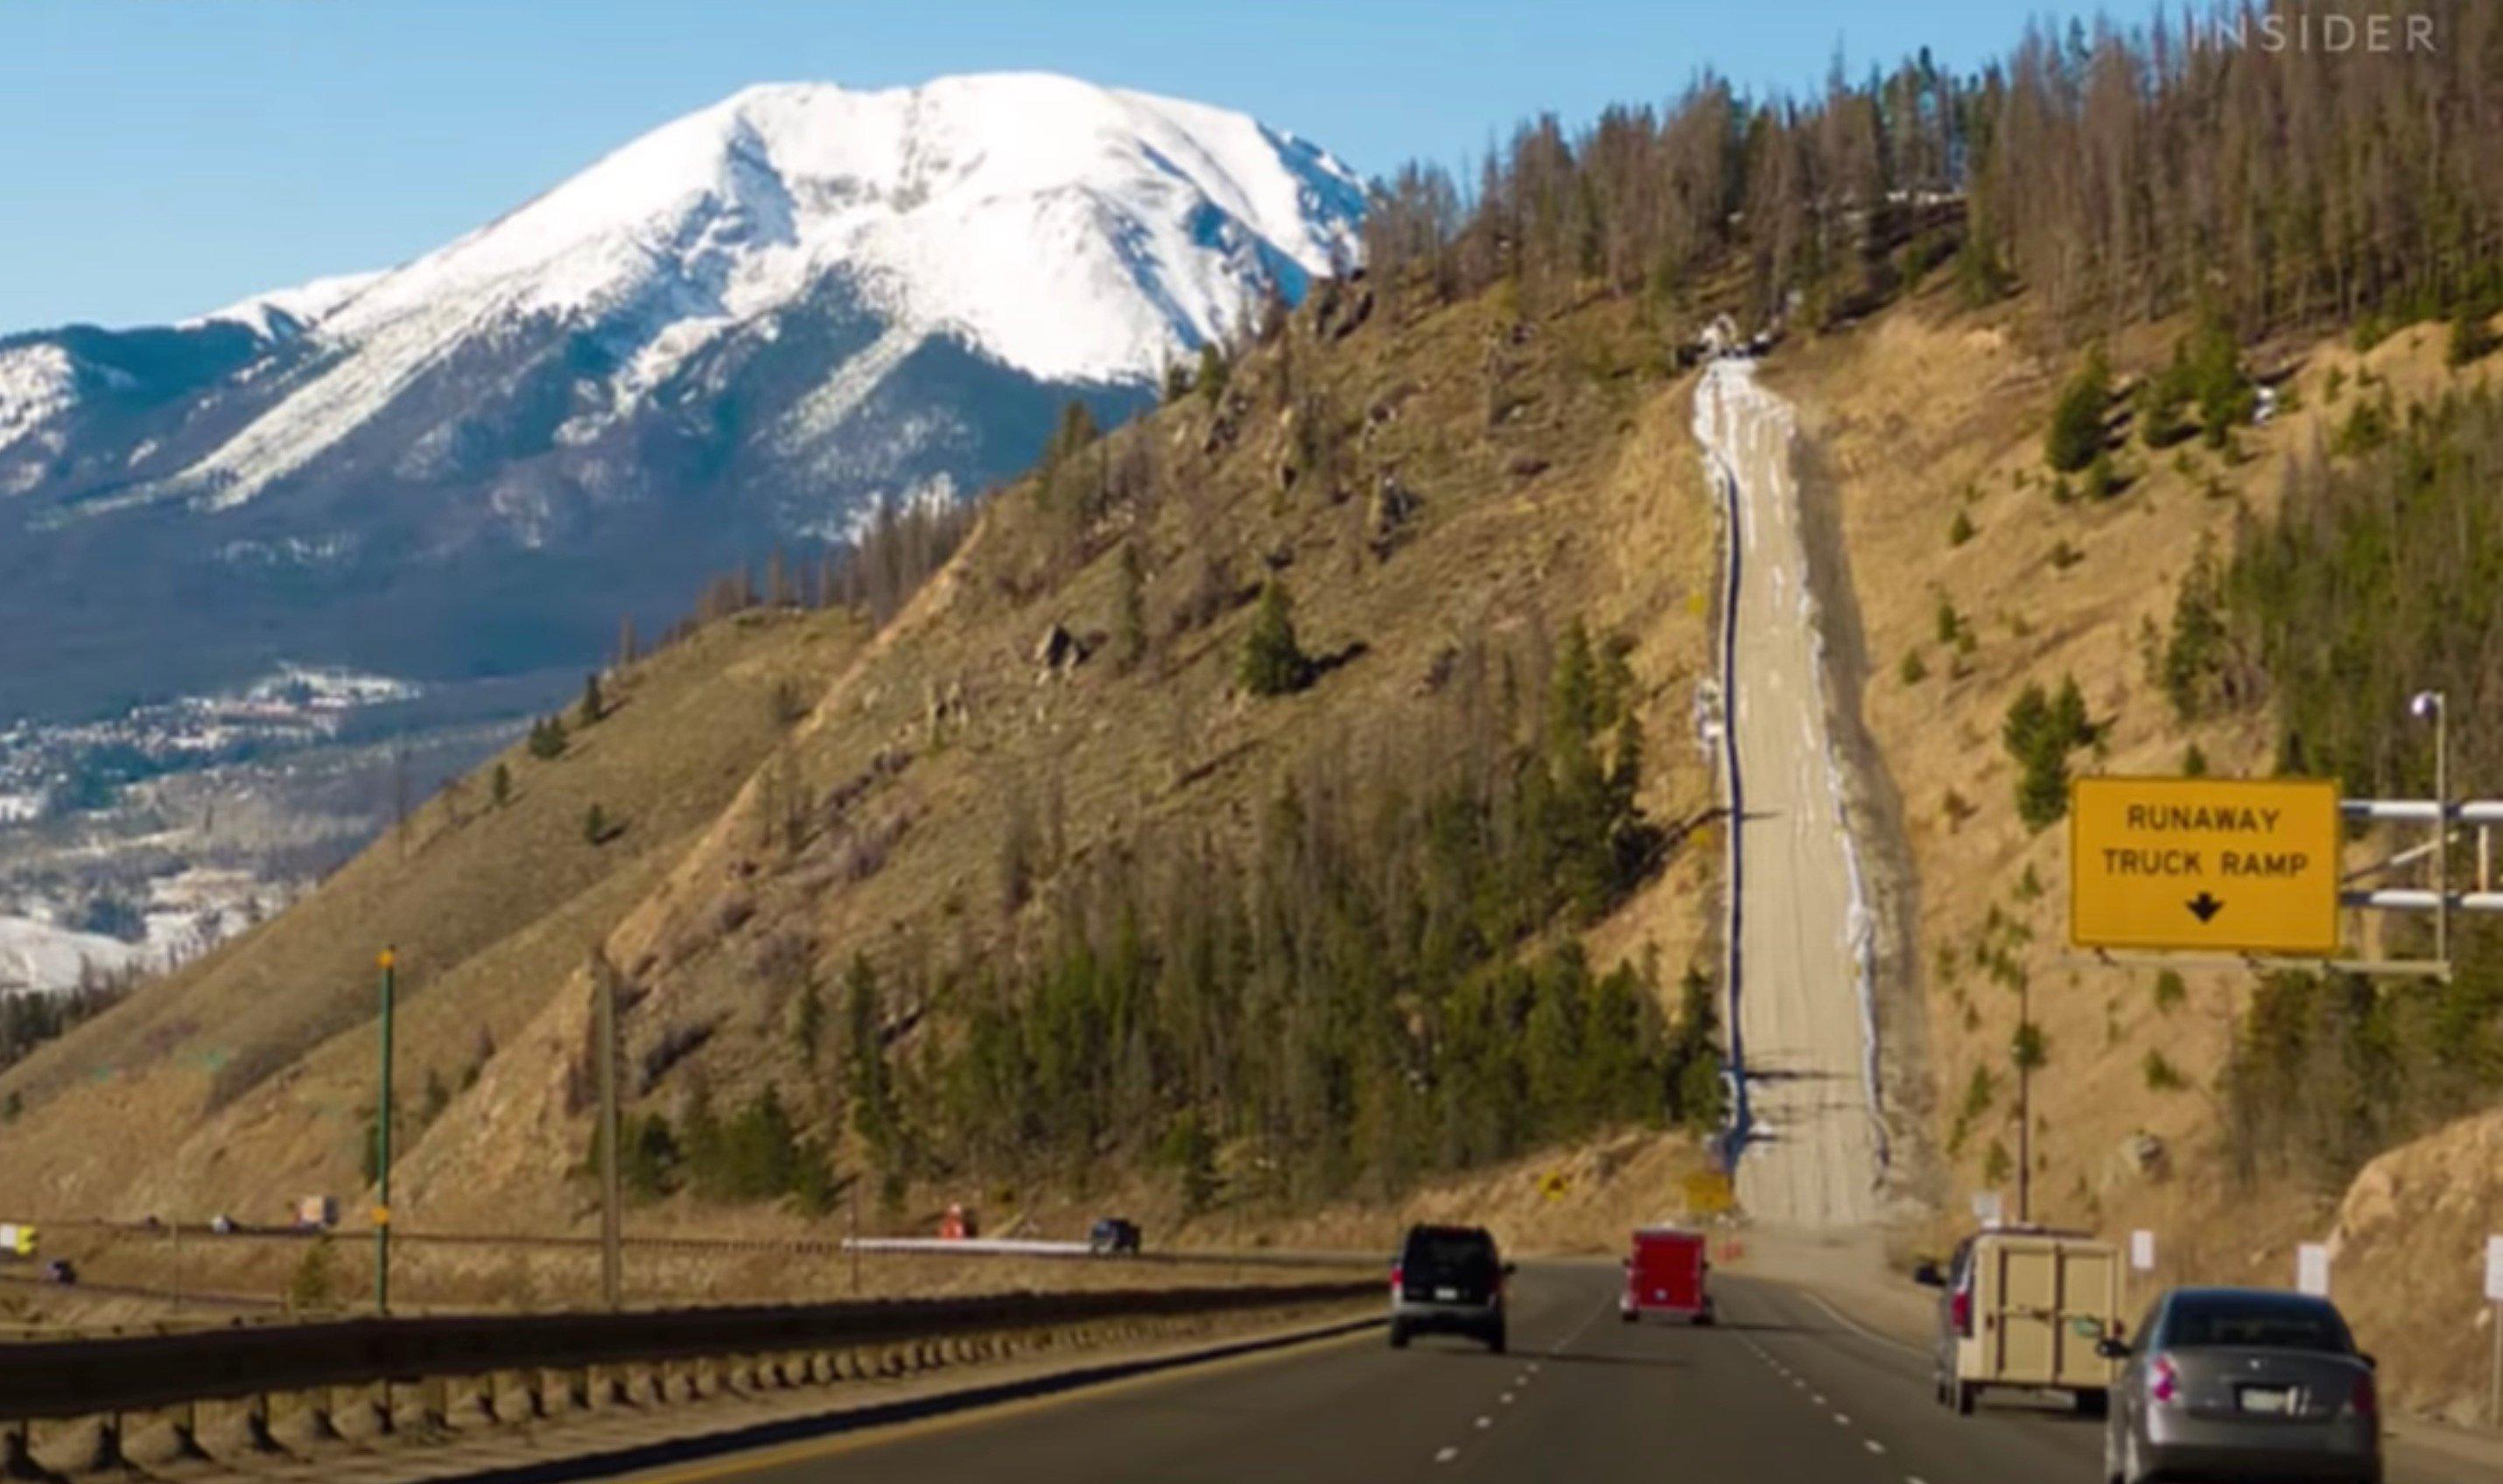 Runaway ramp on steep mountain road - runaway ramp